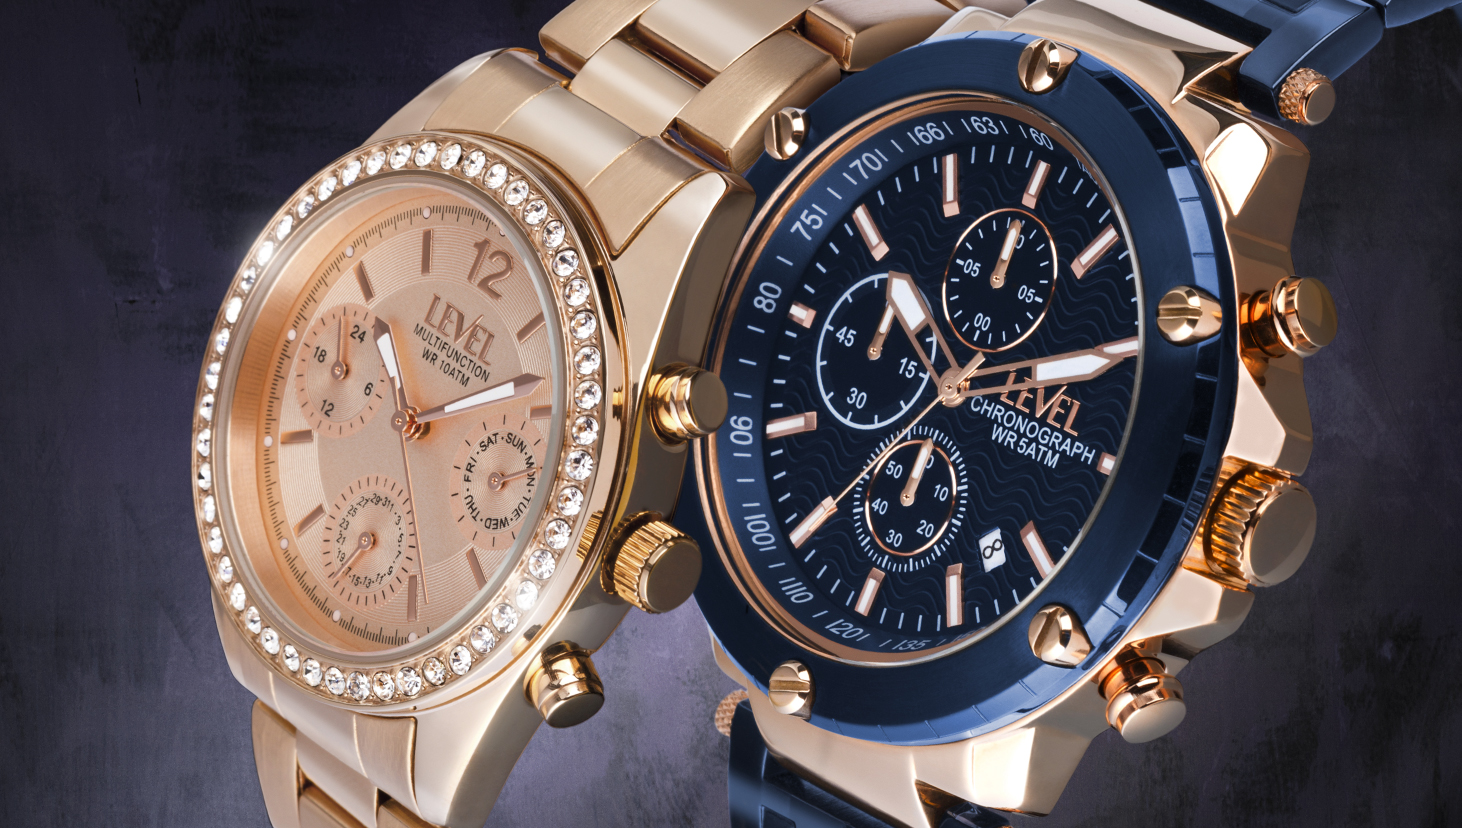 distribuidores de relojes